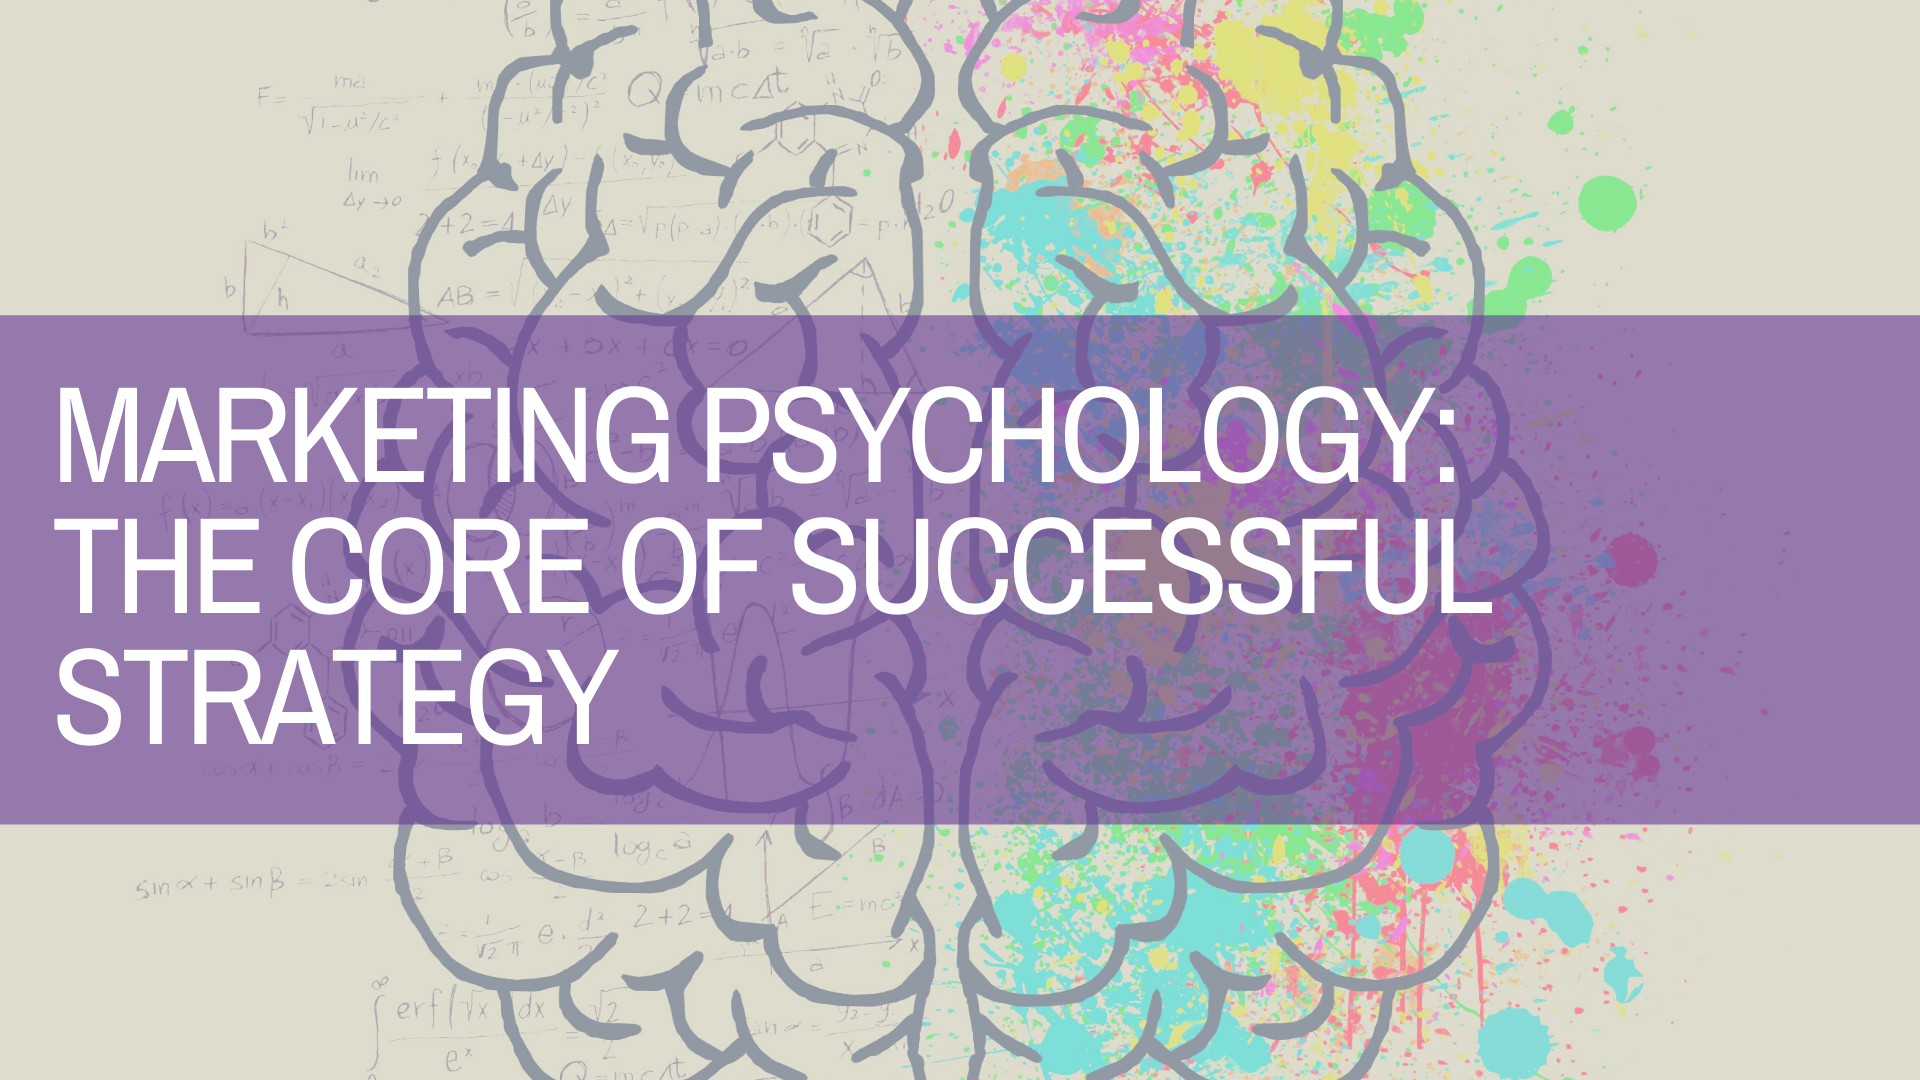 5 Psychology Hacks To Influence Consumer Behavior